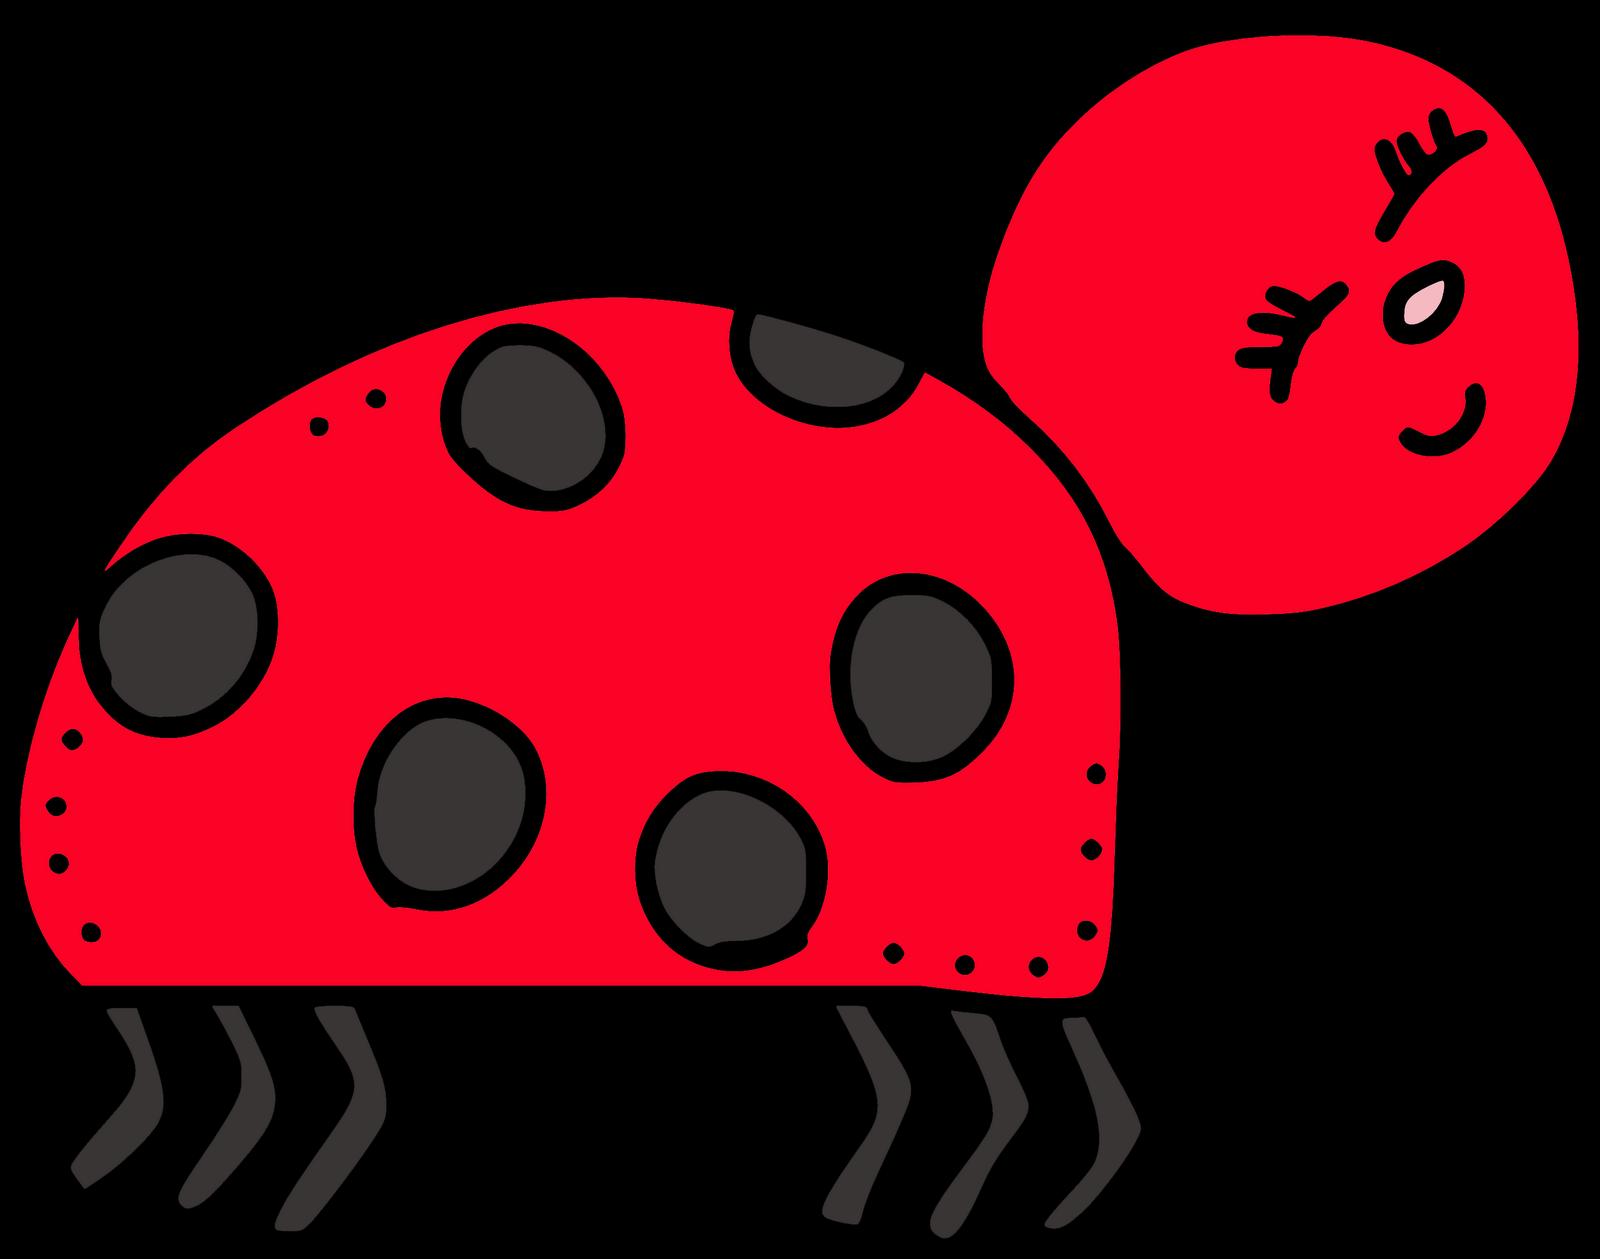 Bug clip art free clipart 3